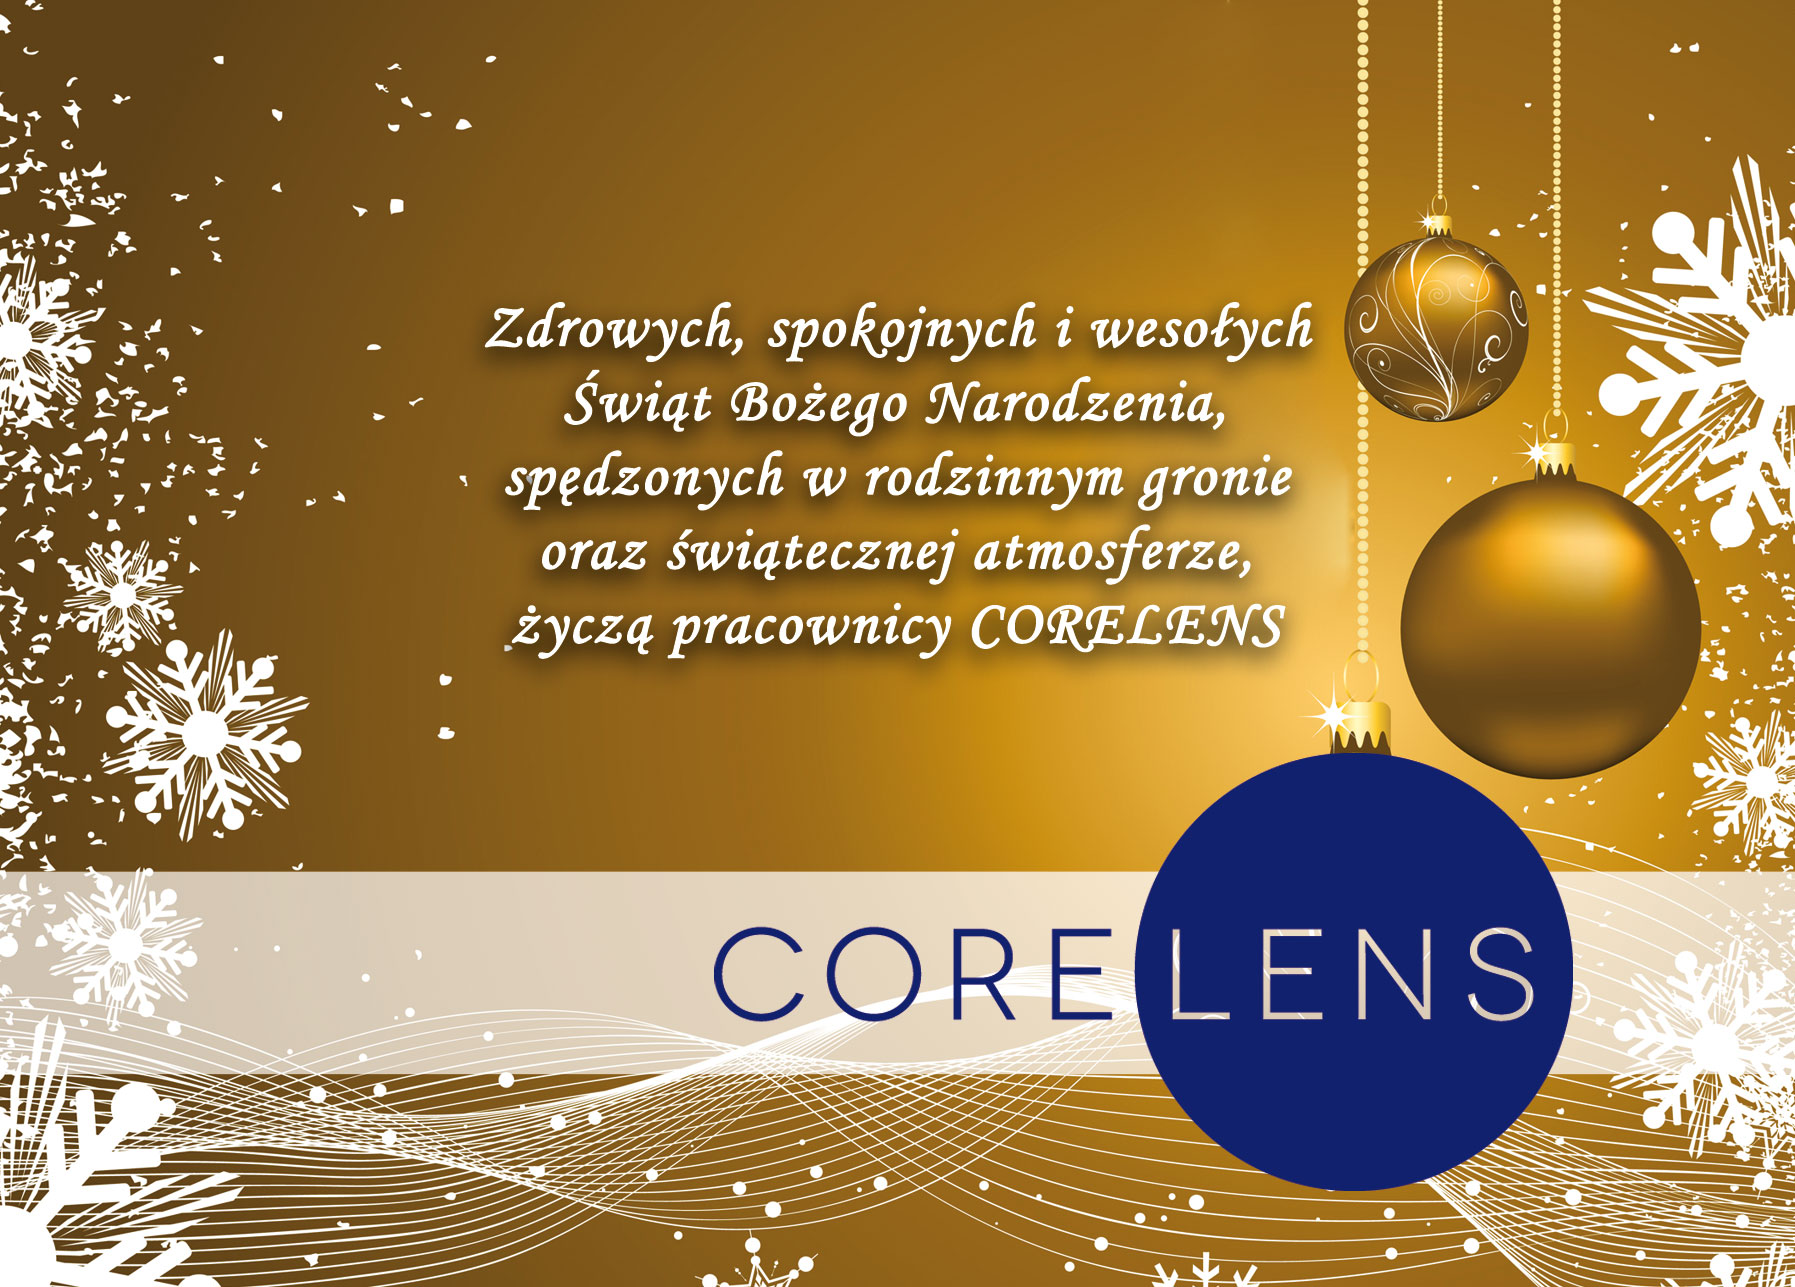 corelens-kartka-gotowo2